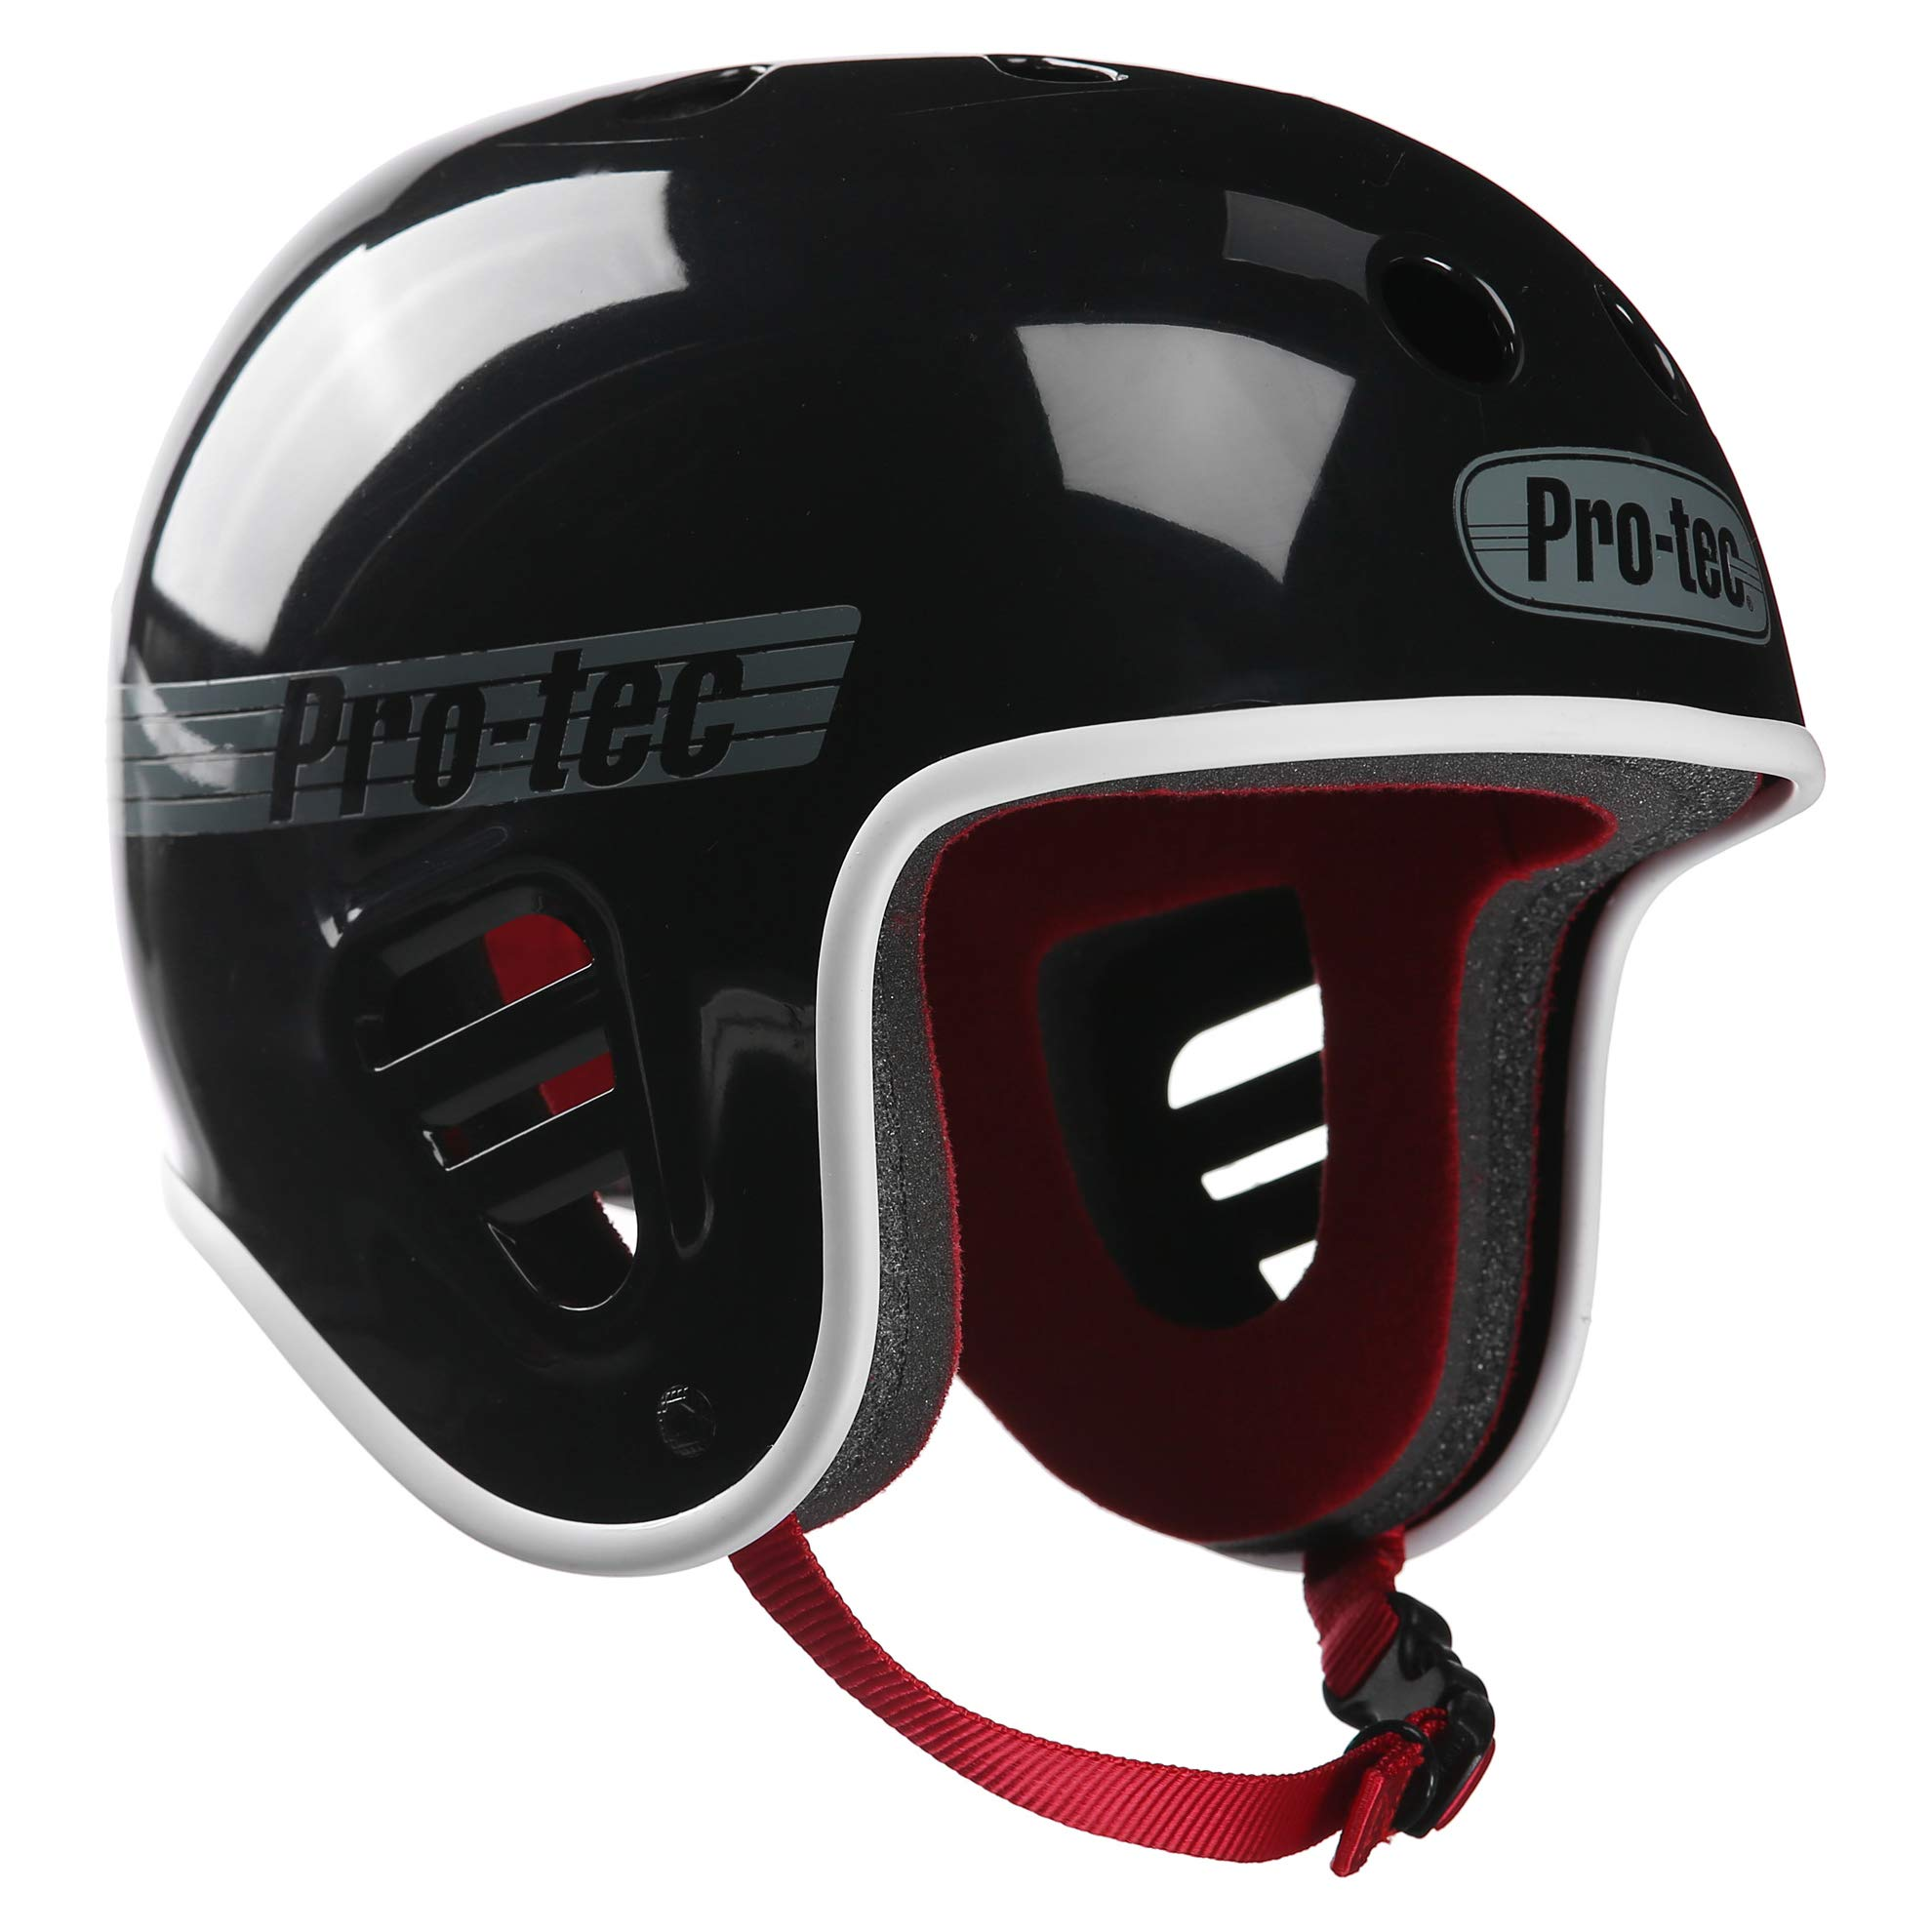 Pro-Tec Full Cut Skate Helmet, Gloss Black, Medium